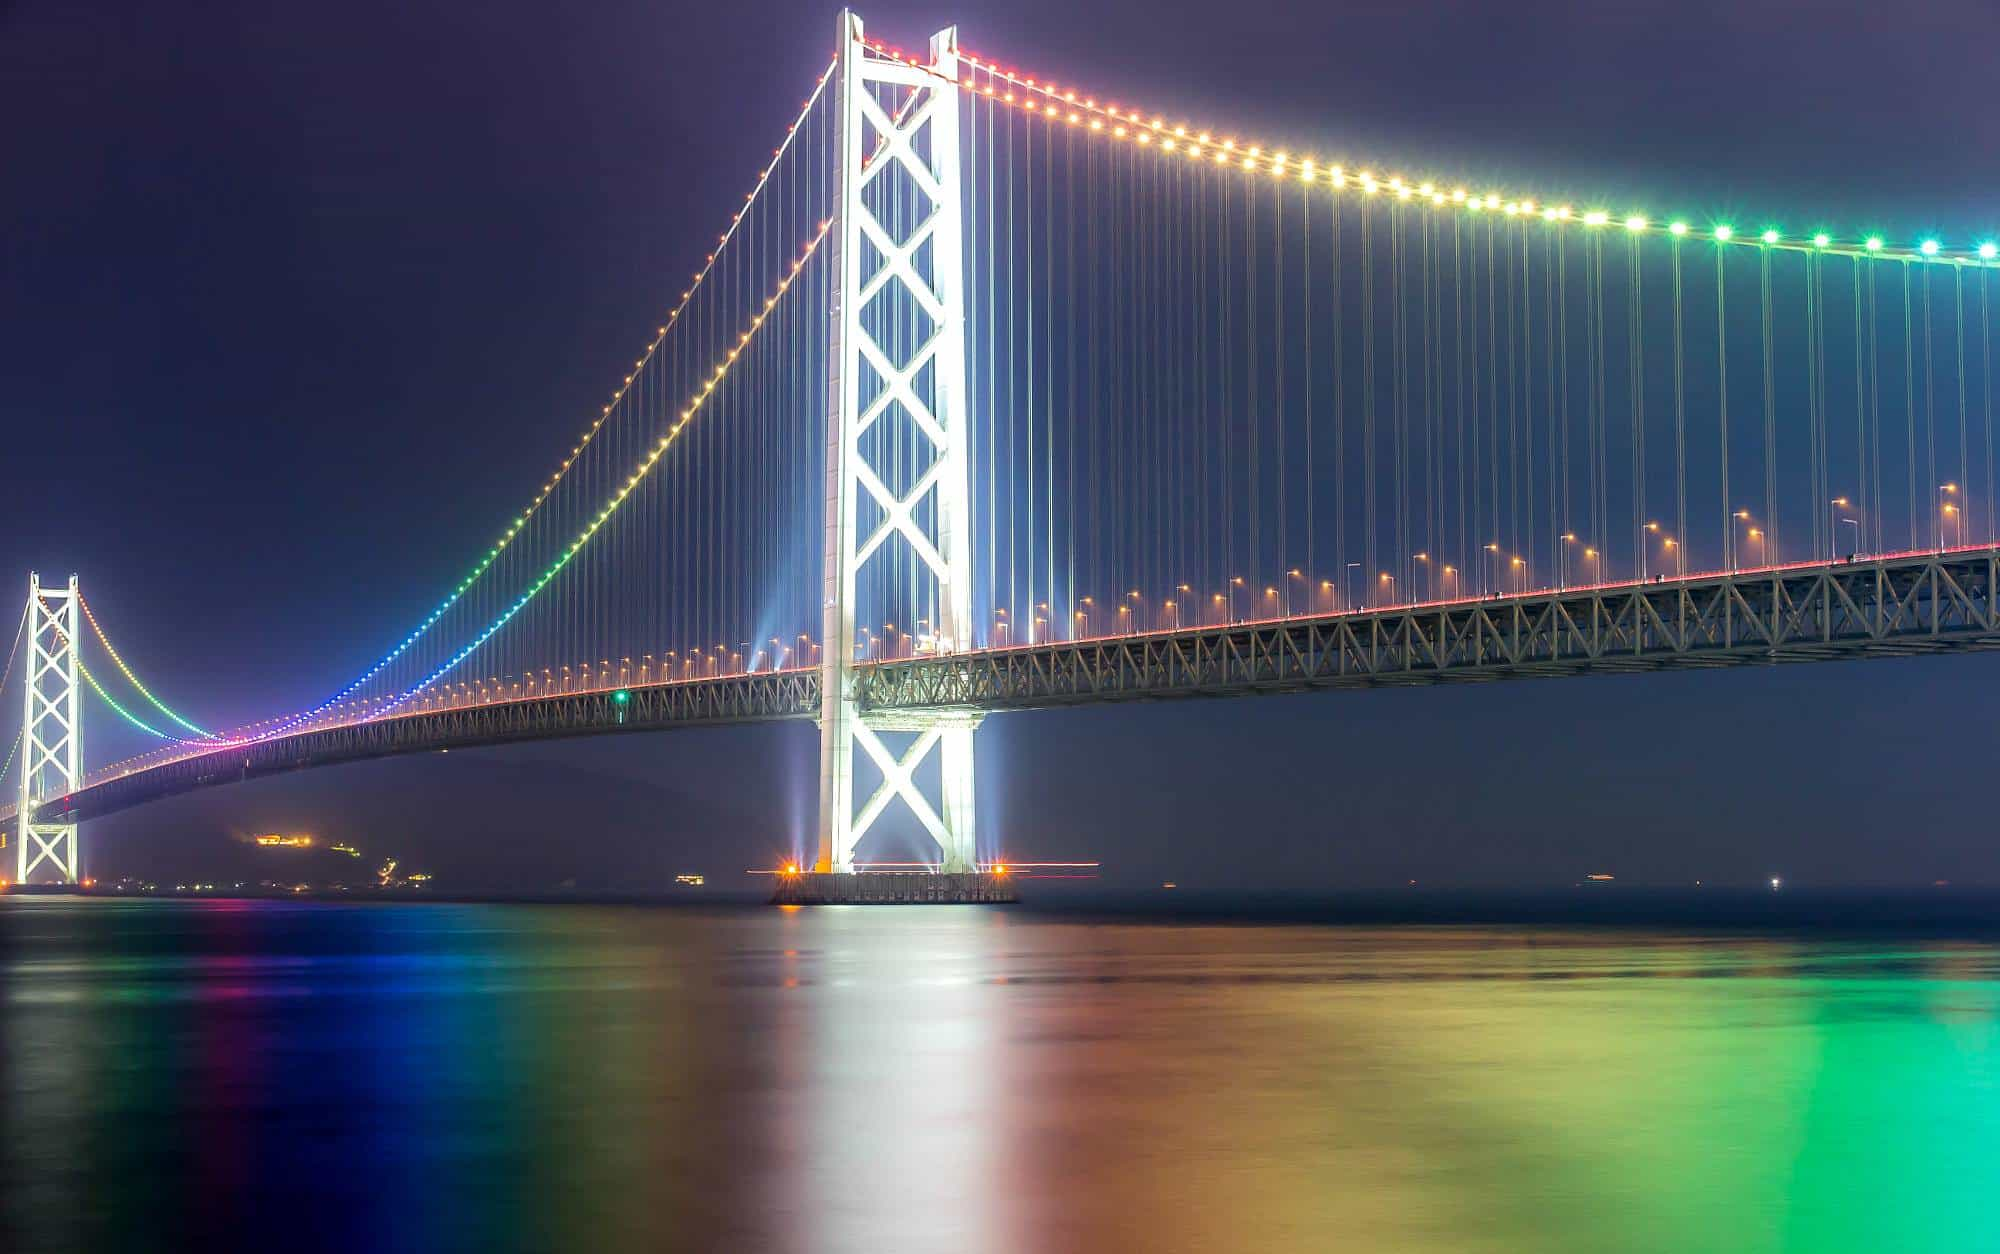 Туры в Японию. Мост Акаси фото